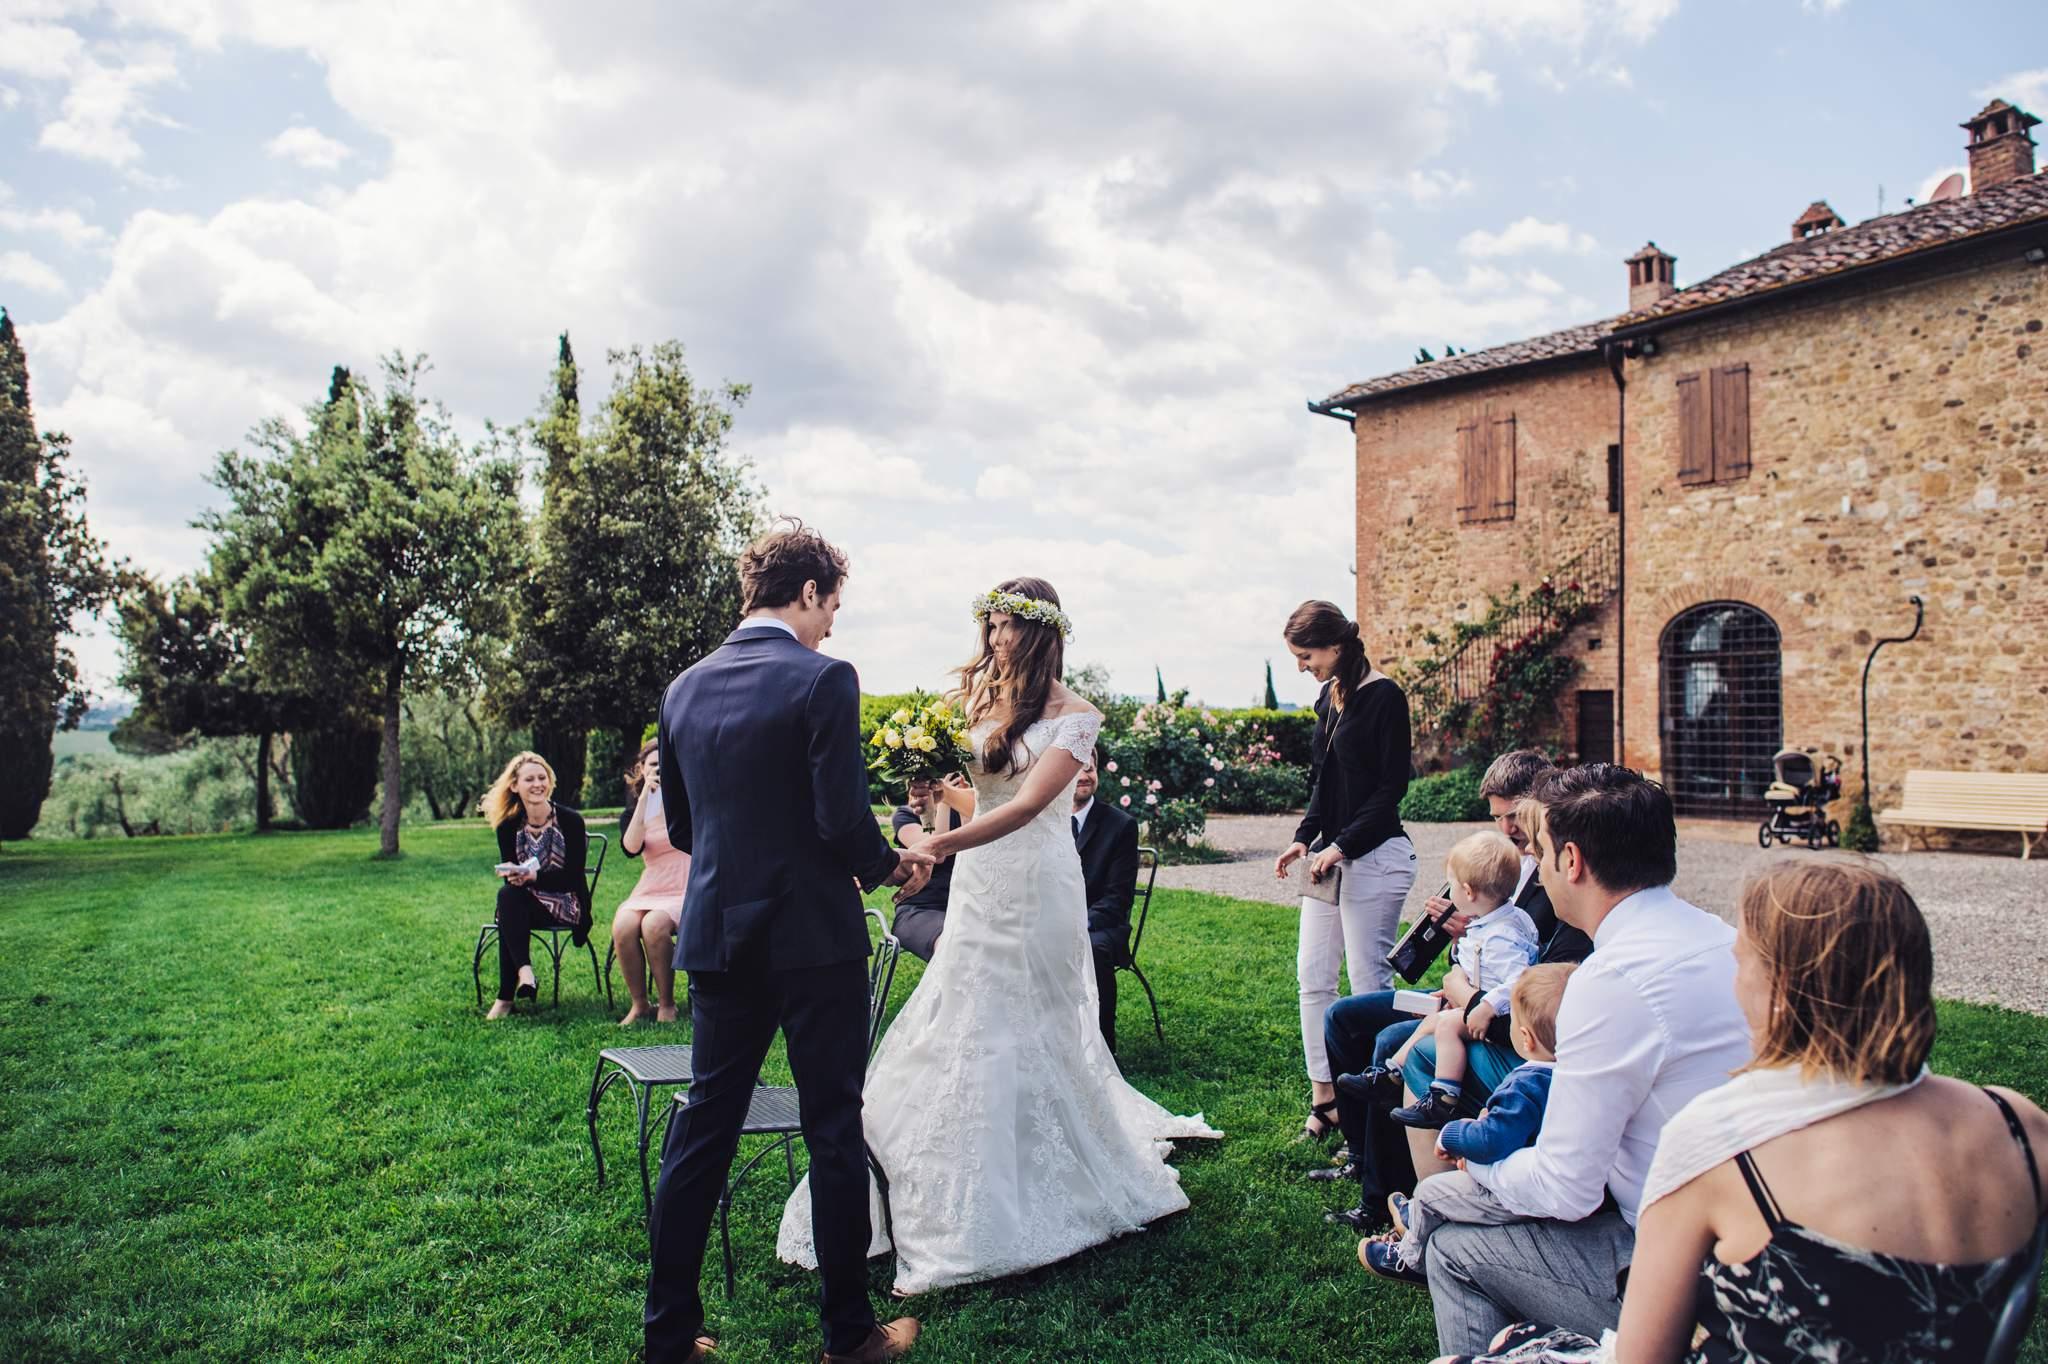 13wedding-photographer-tuscany-siena